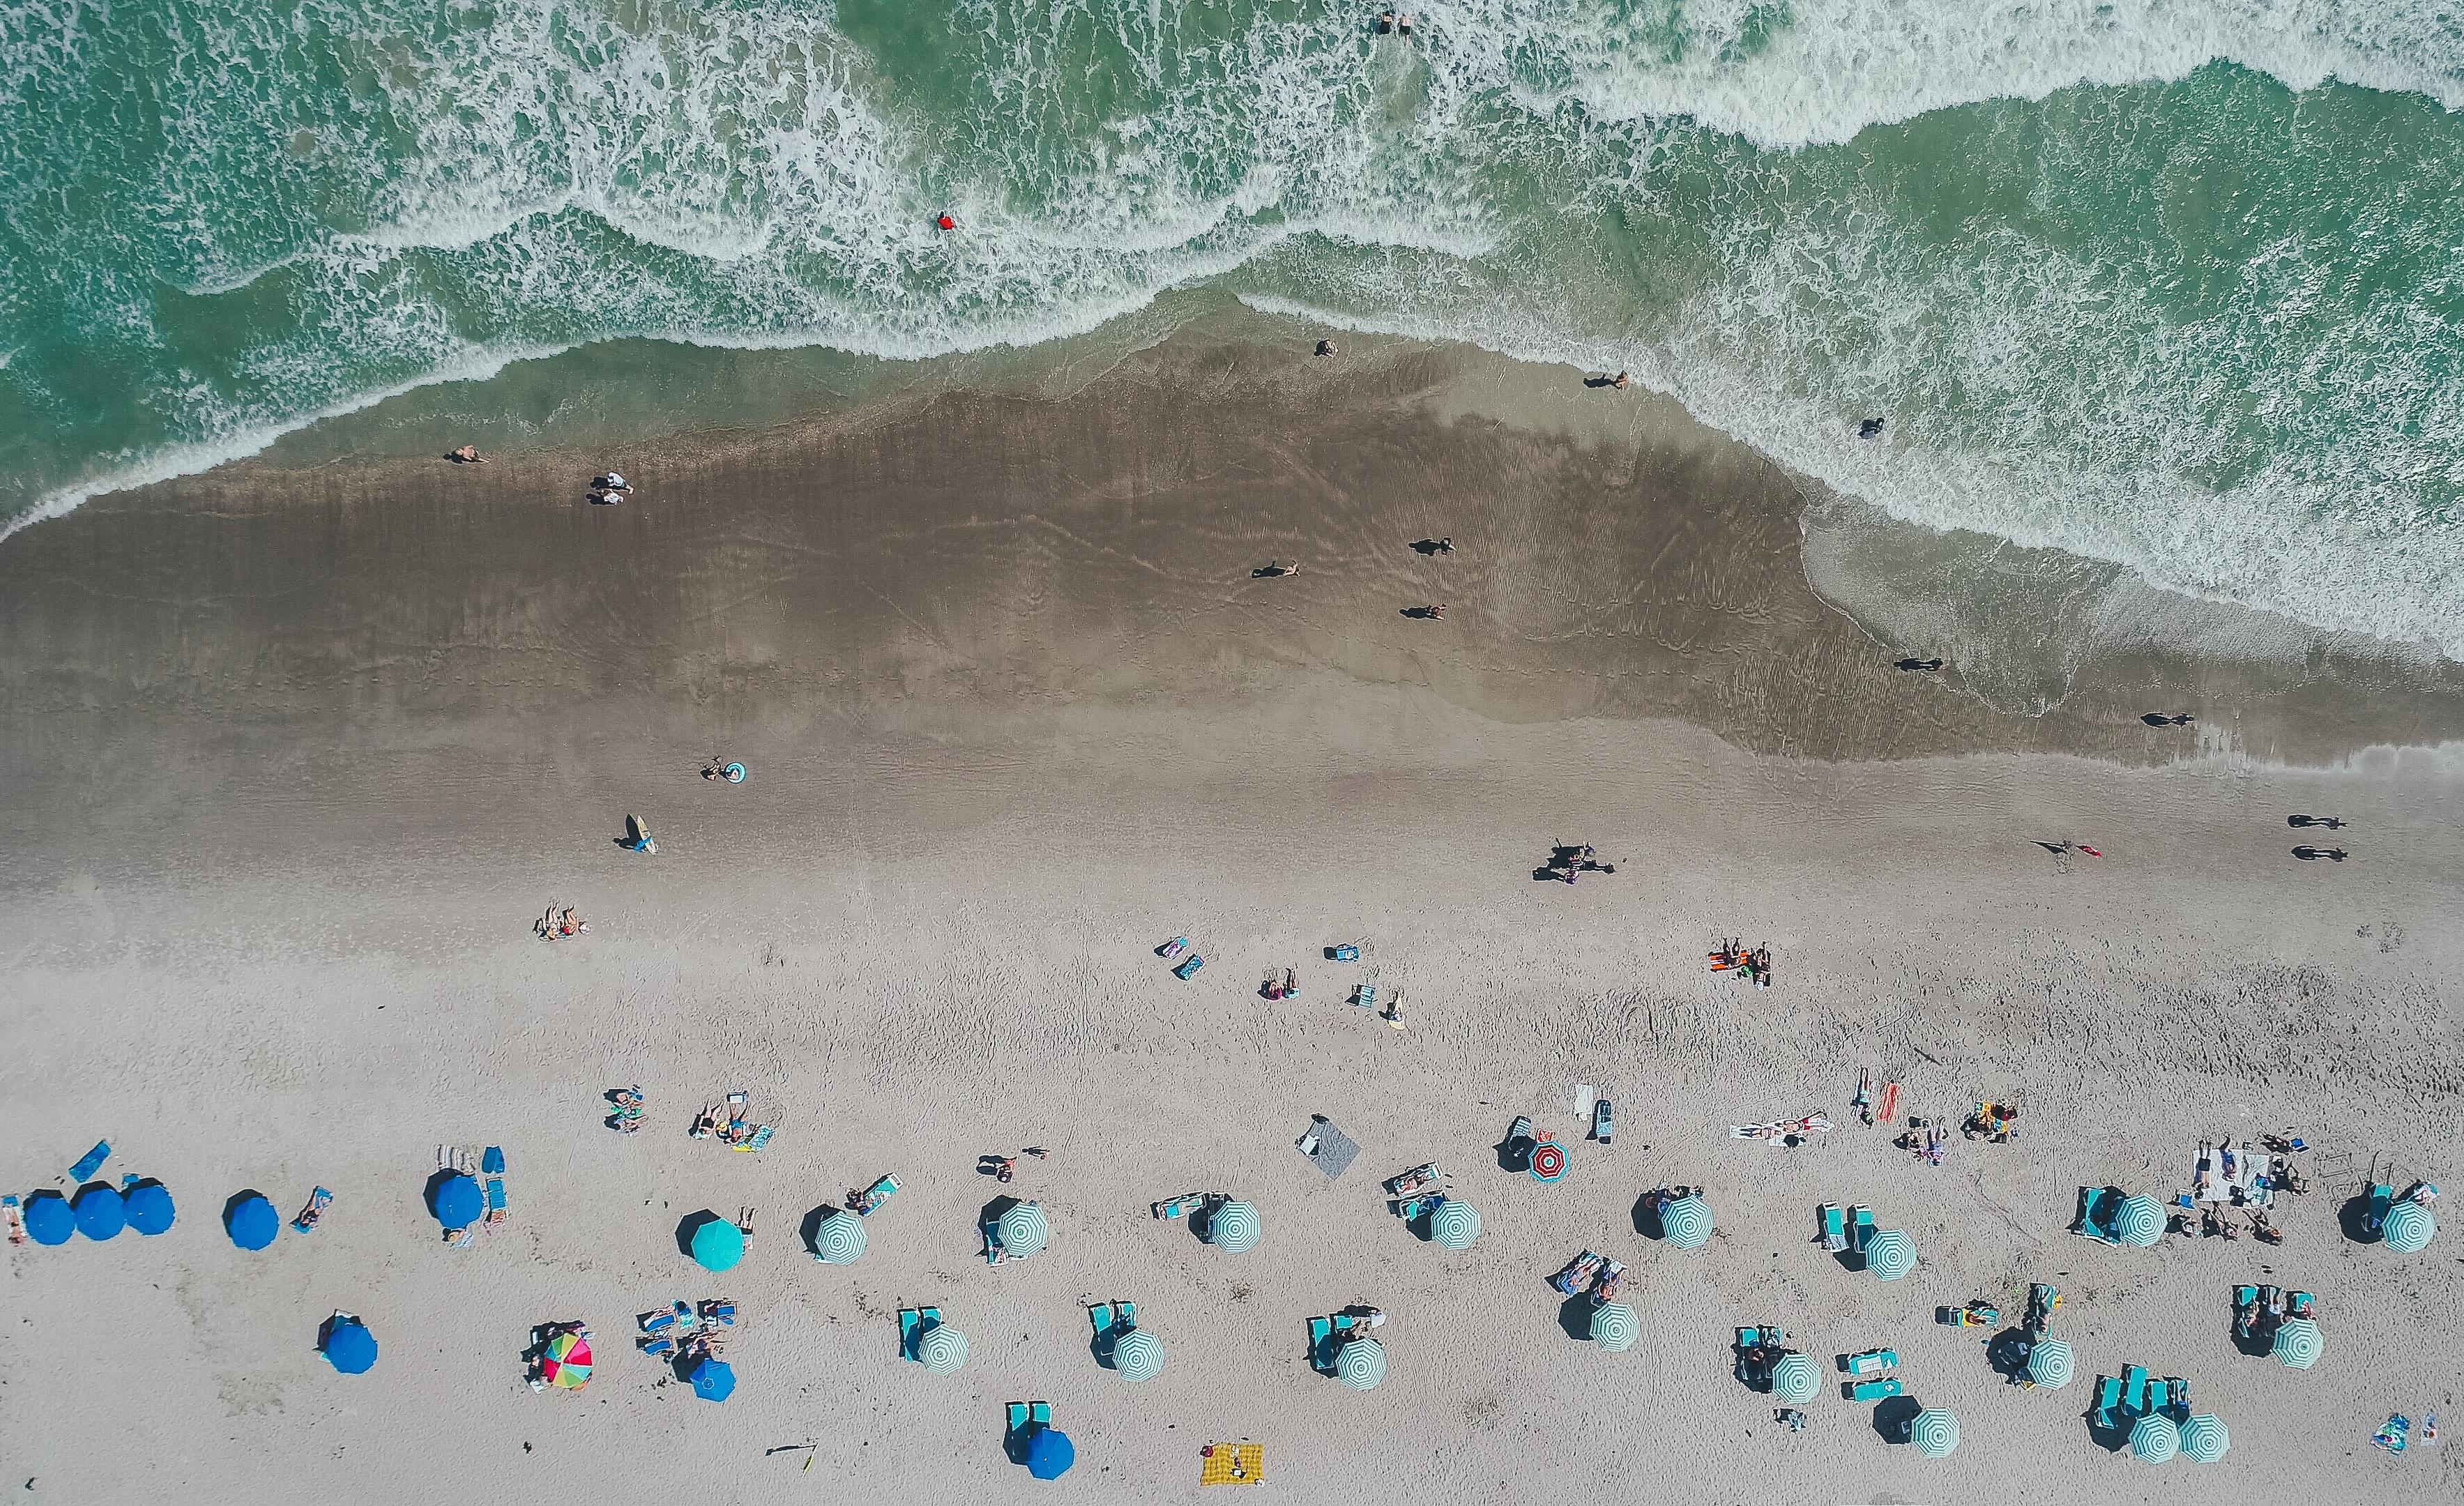 bird's eye view of people on shoreline near body of water